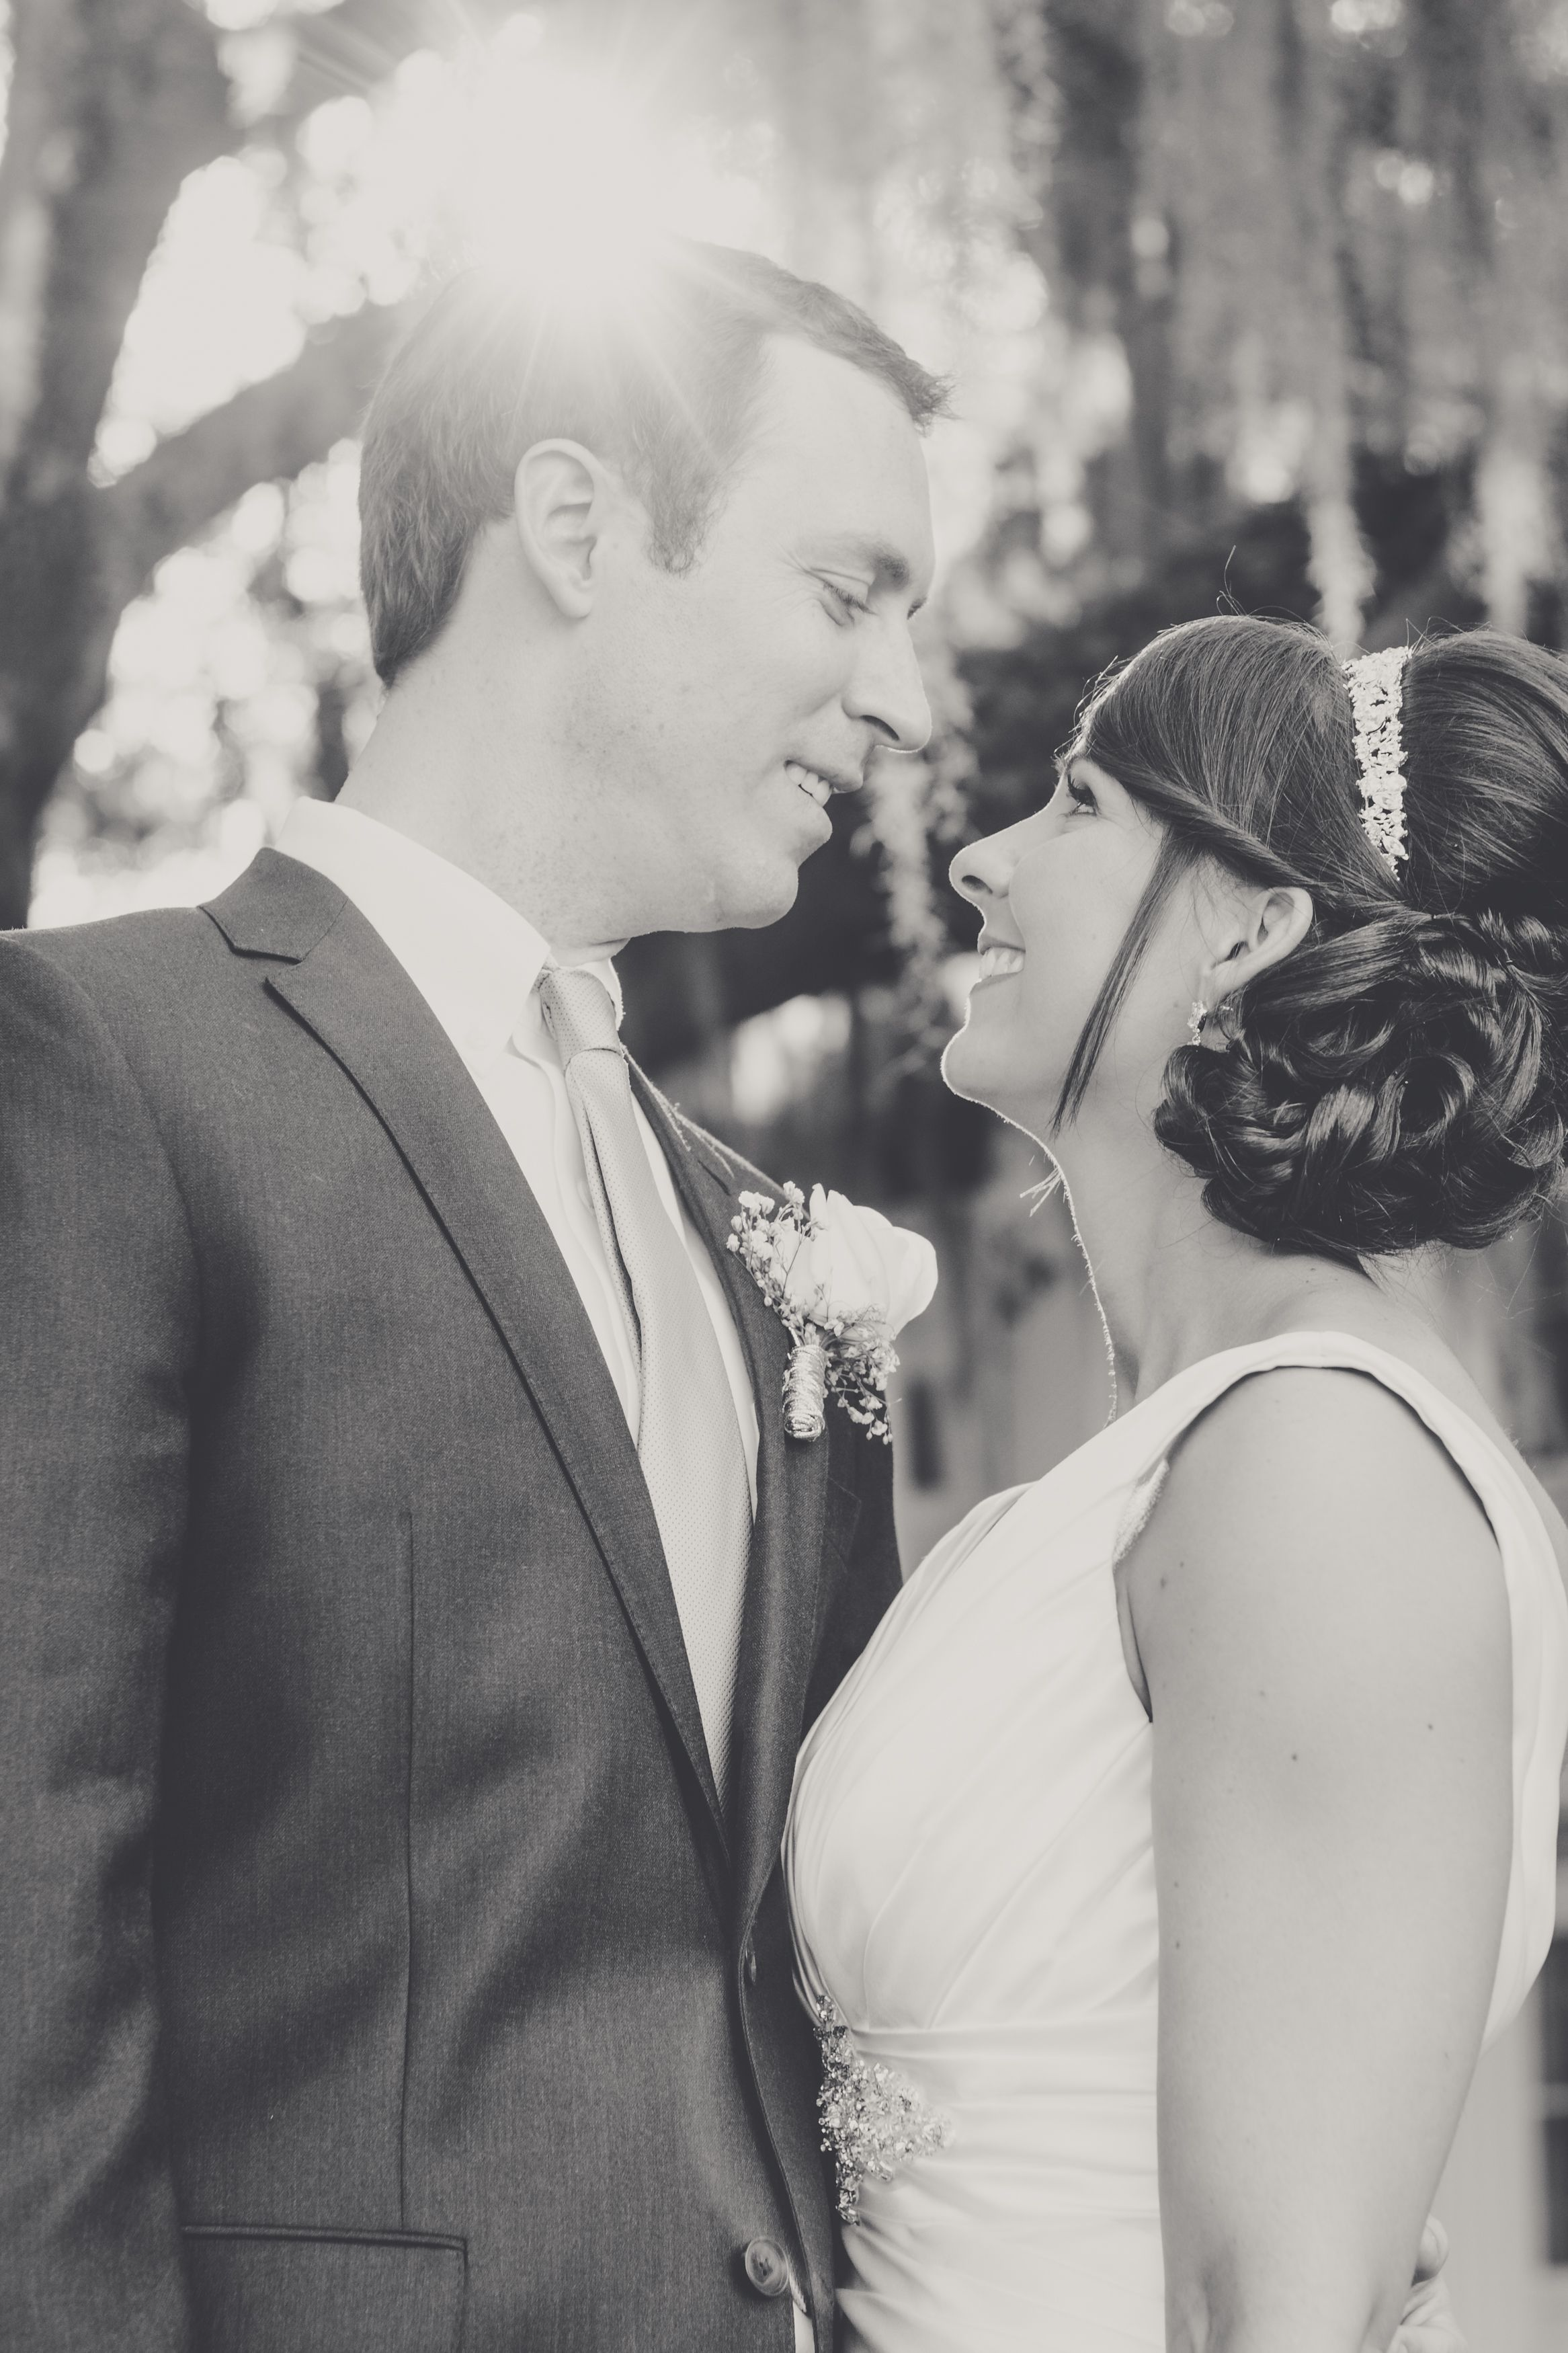 Wedding Poses, Couple poses, Southern weddings, Florida Weddings, Wedding photography